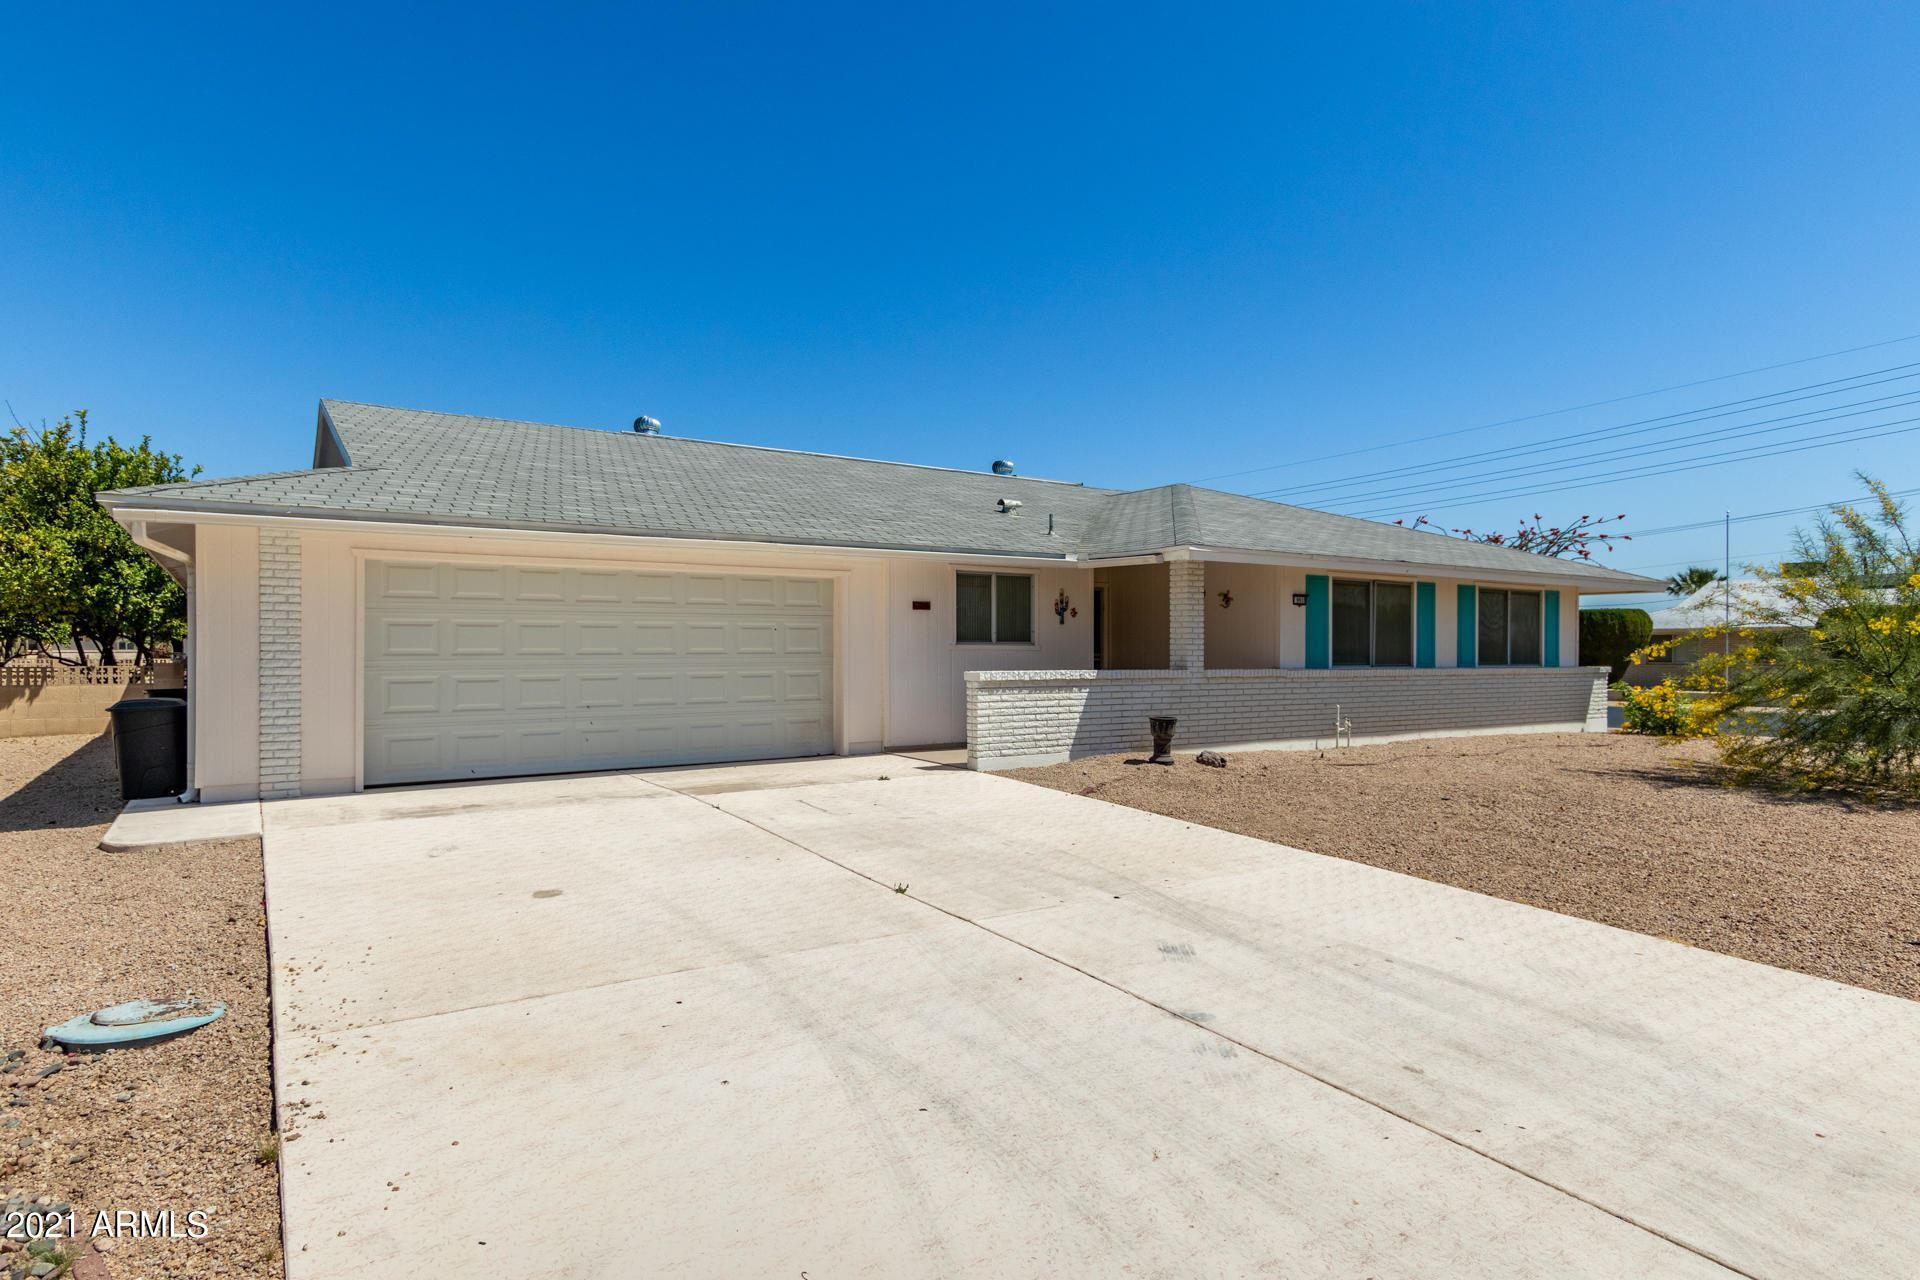 Photo of 9918 W IRONWOOD Drive, Sun City, AZ 85351 (MLS # 6307127)